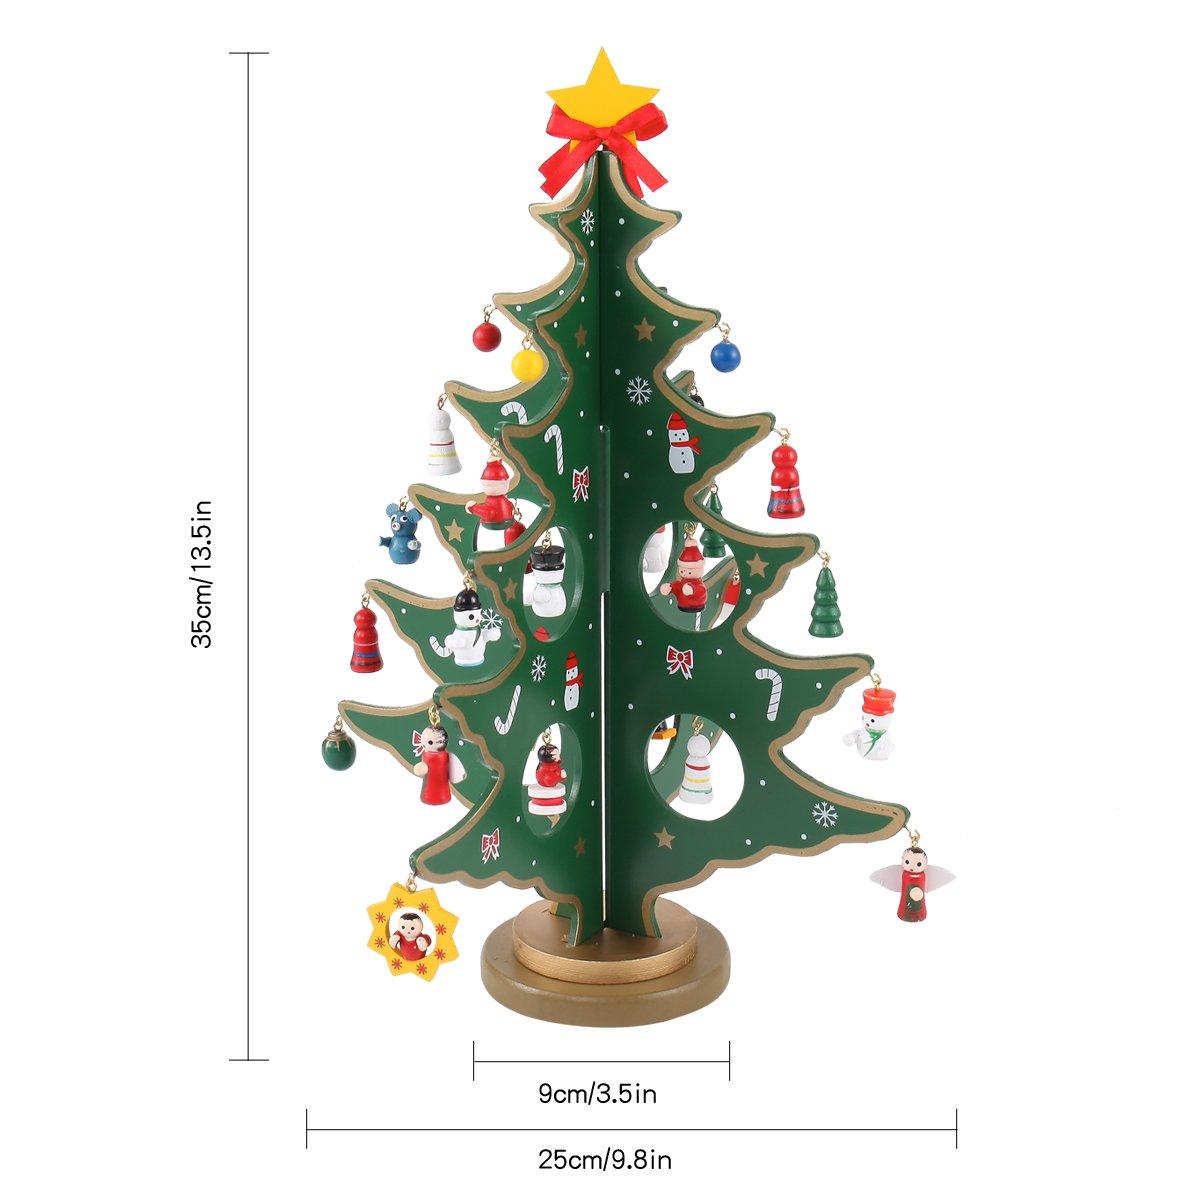 Amazon.com: Joyin Toy 14 inch Tabletop Mini Wooden Christmas Tree ...